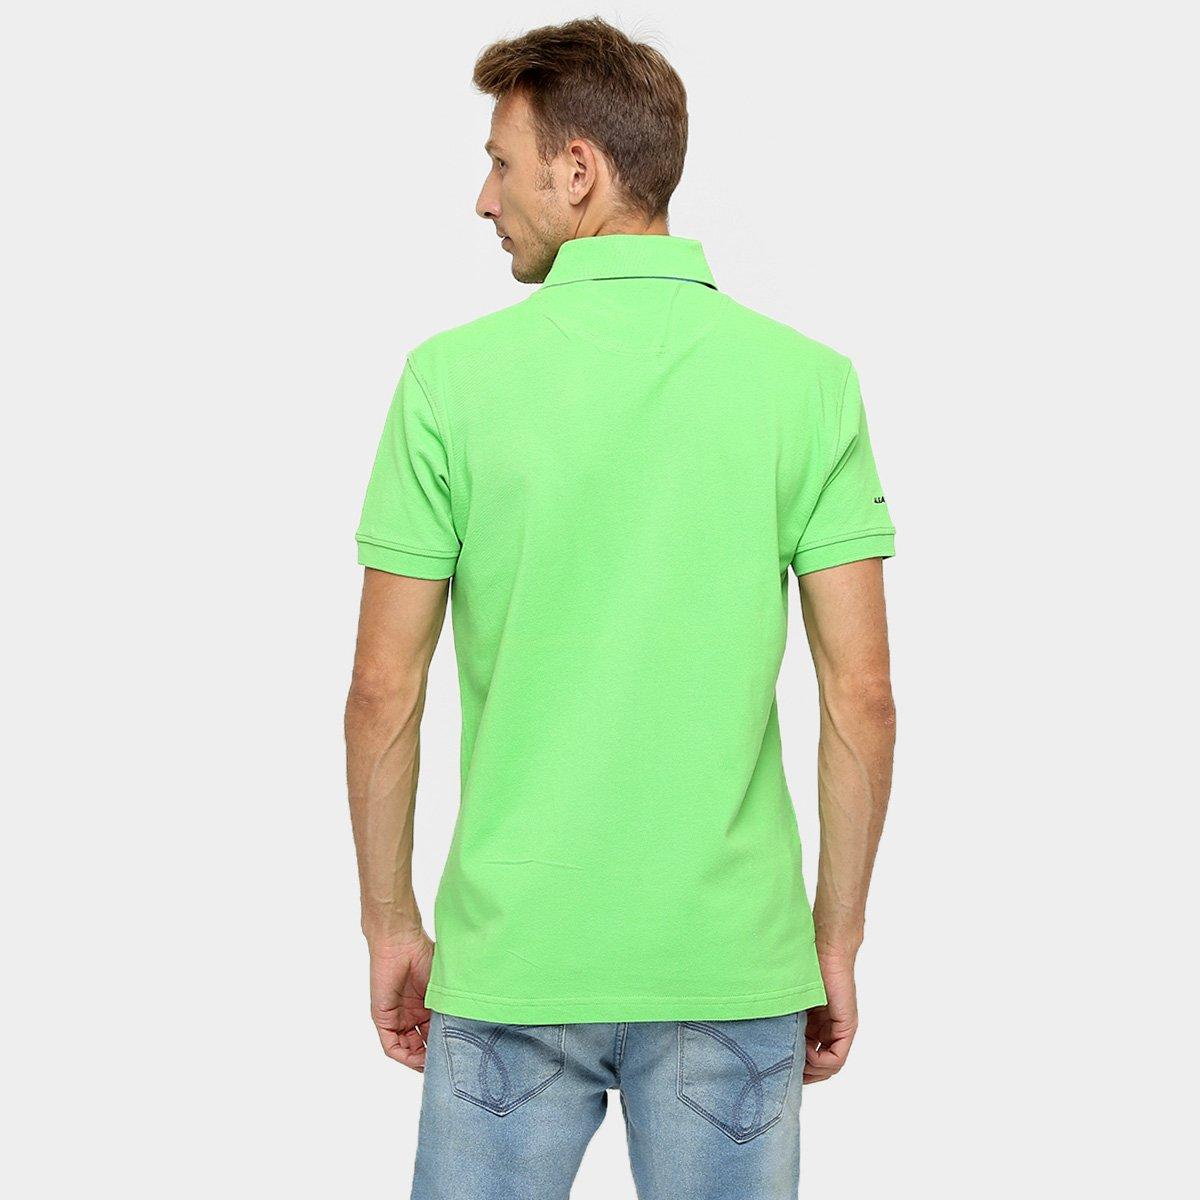 4539b92726687 Camisa Polo Aleatory Piquet Bordada  Camisa Polo Aleatory Piquet Bordada ...